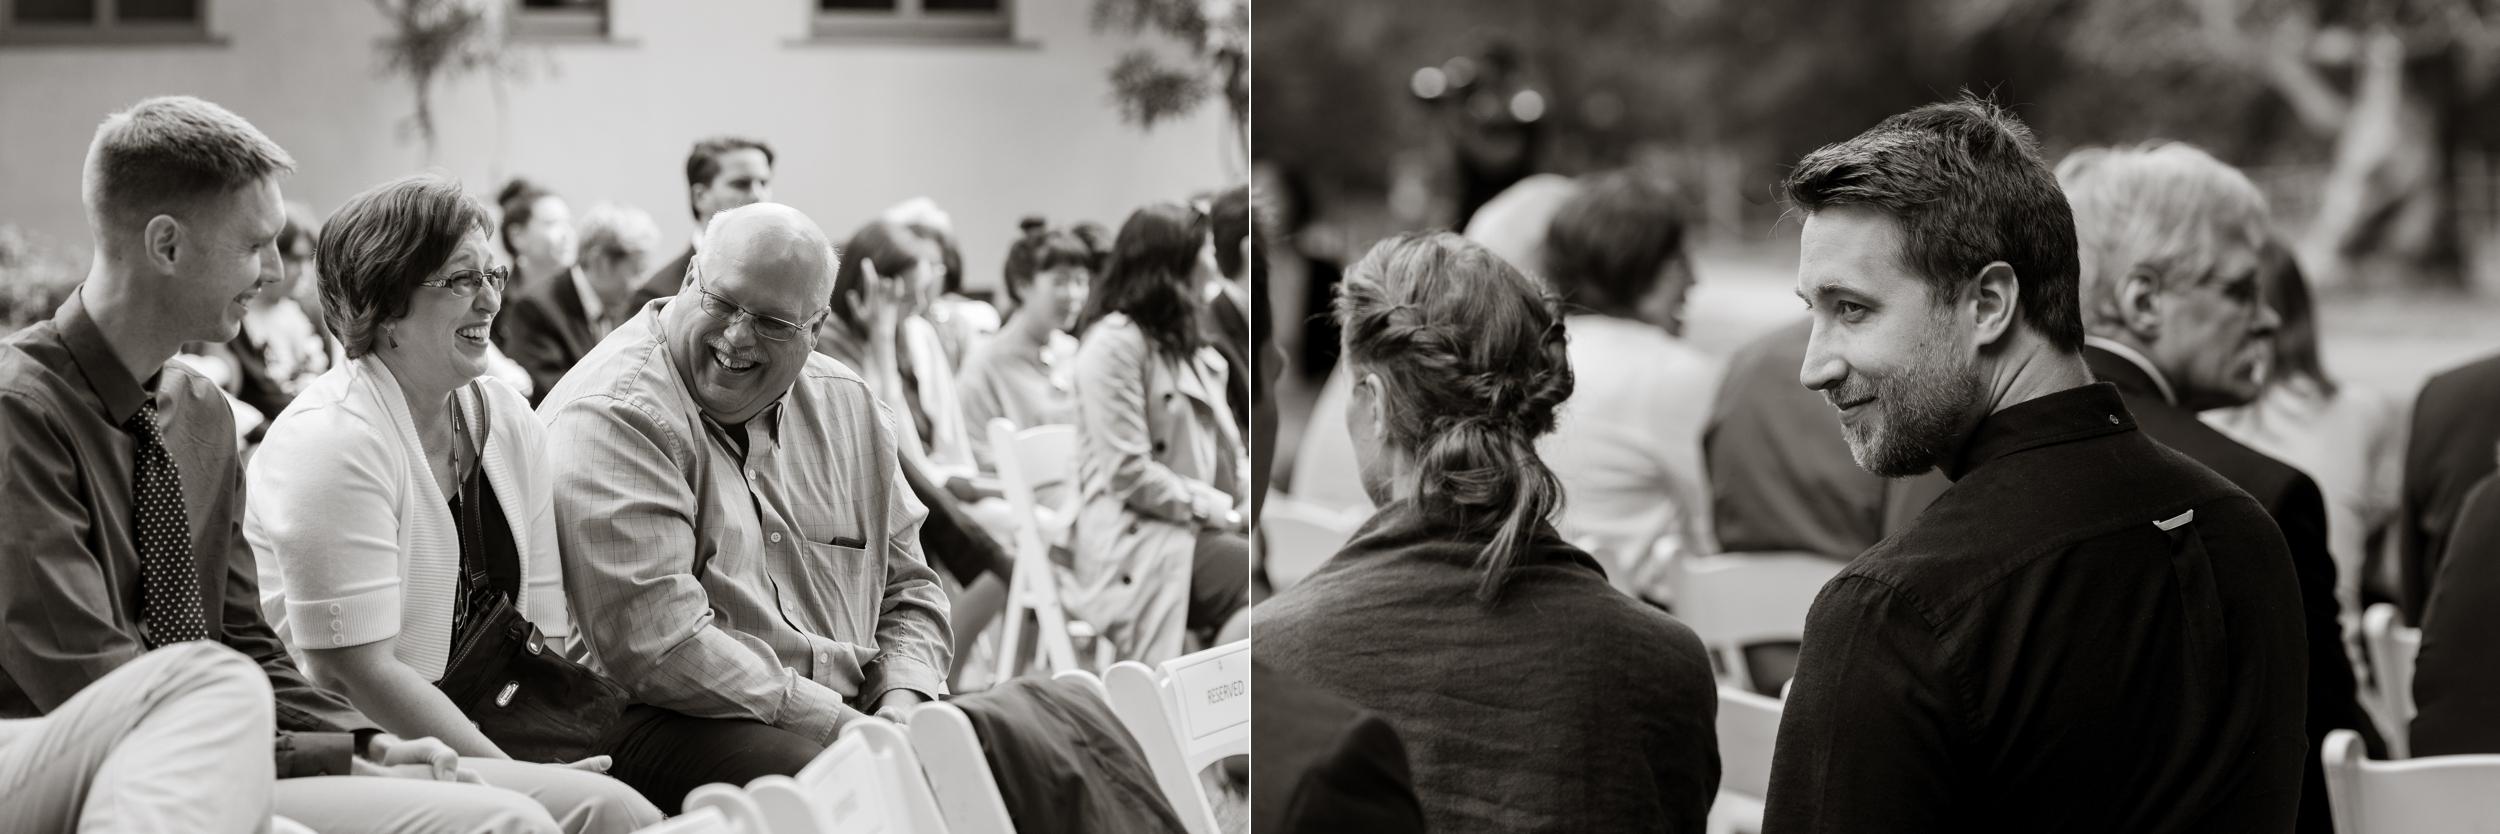 faculty-club-berkeley-wedding-photographer-vc025.jpg